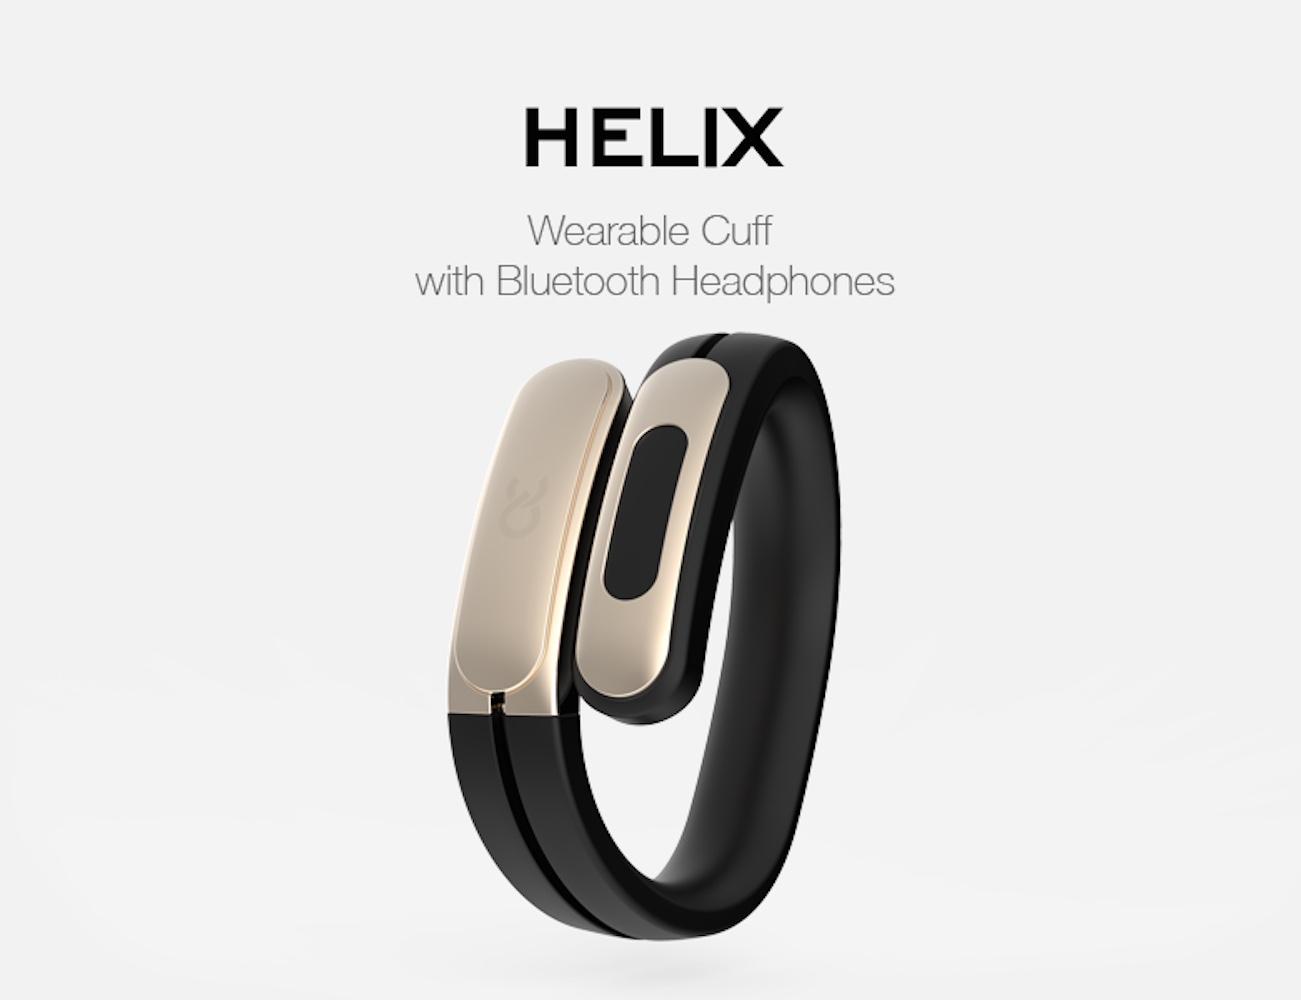 helix-cuff-05